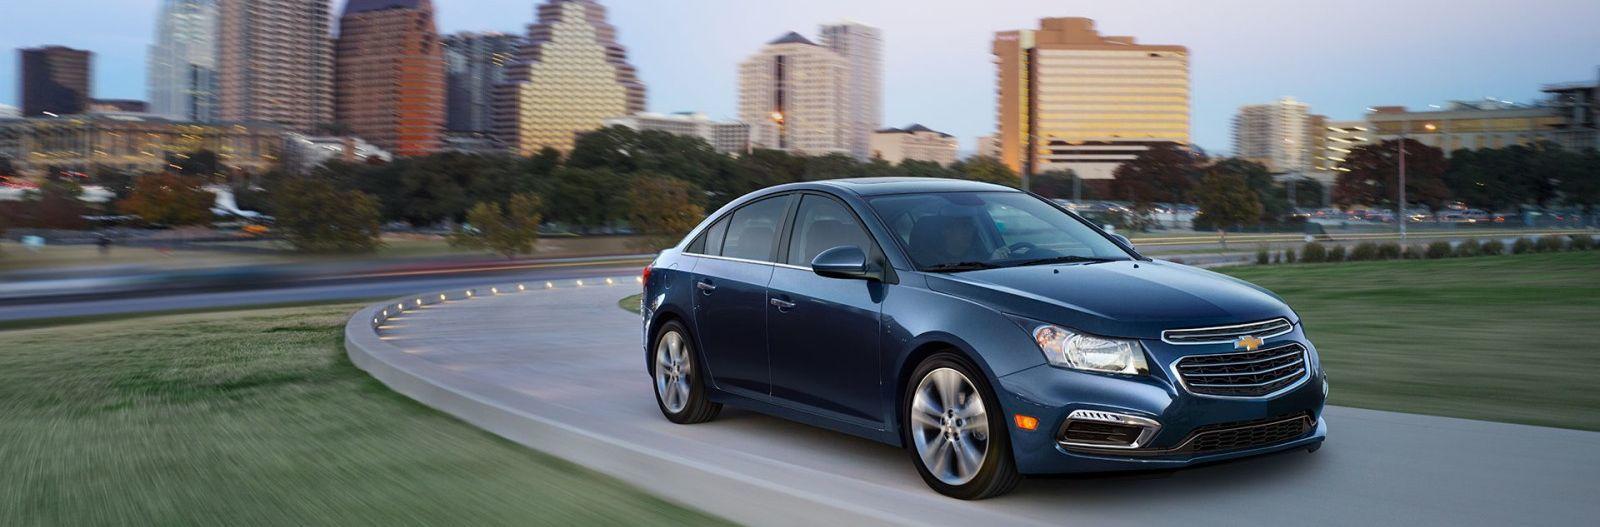 30-Second Auto Loans In Chantilly, VA